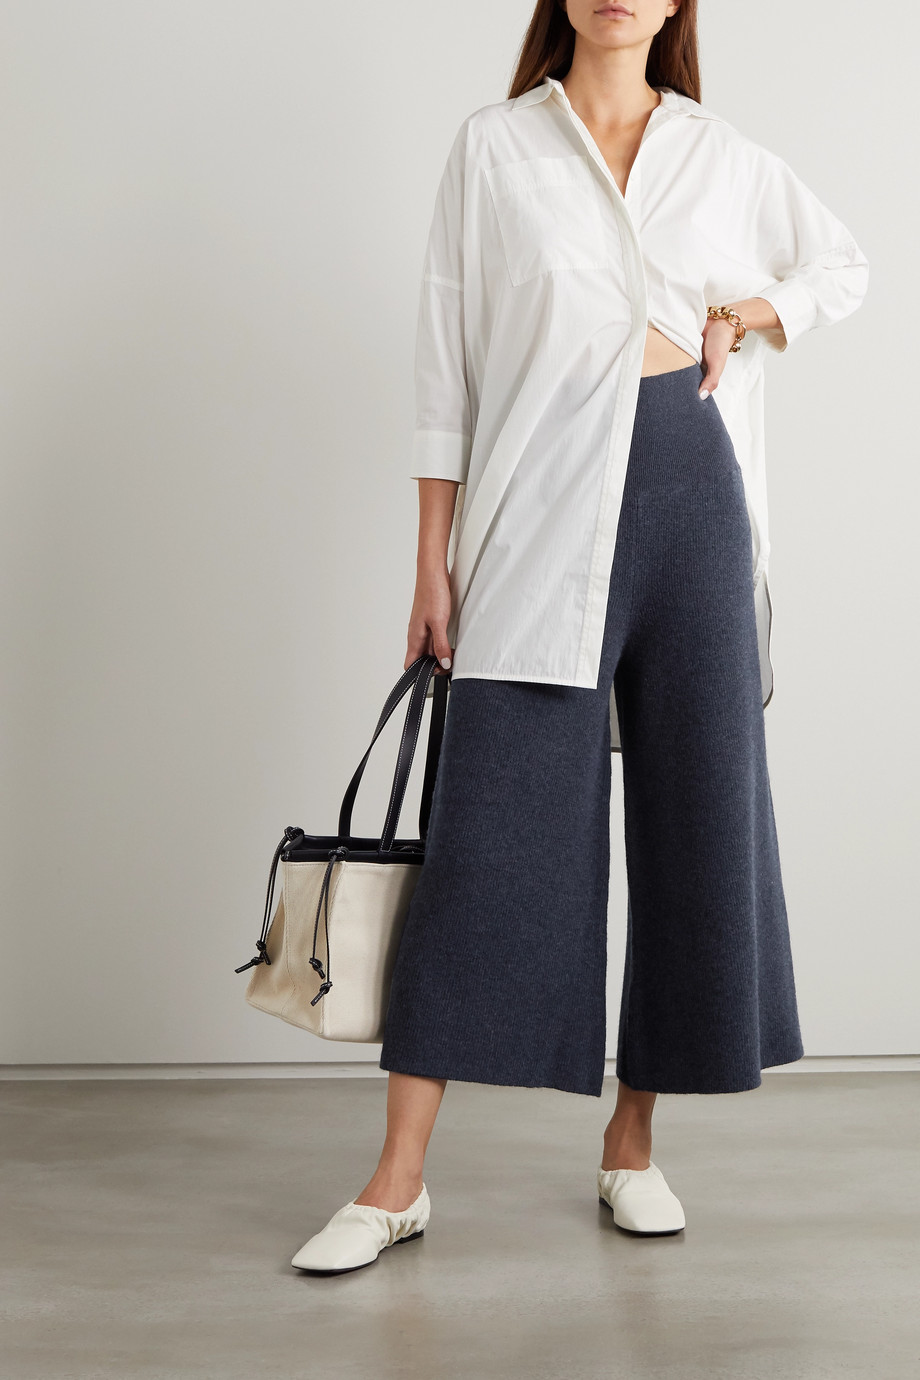 Stella McCartney Ribbed mélange wool and alpaca-blend culottes